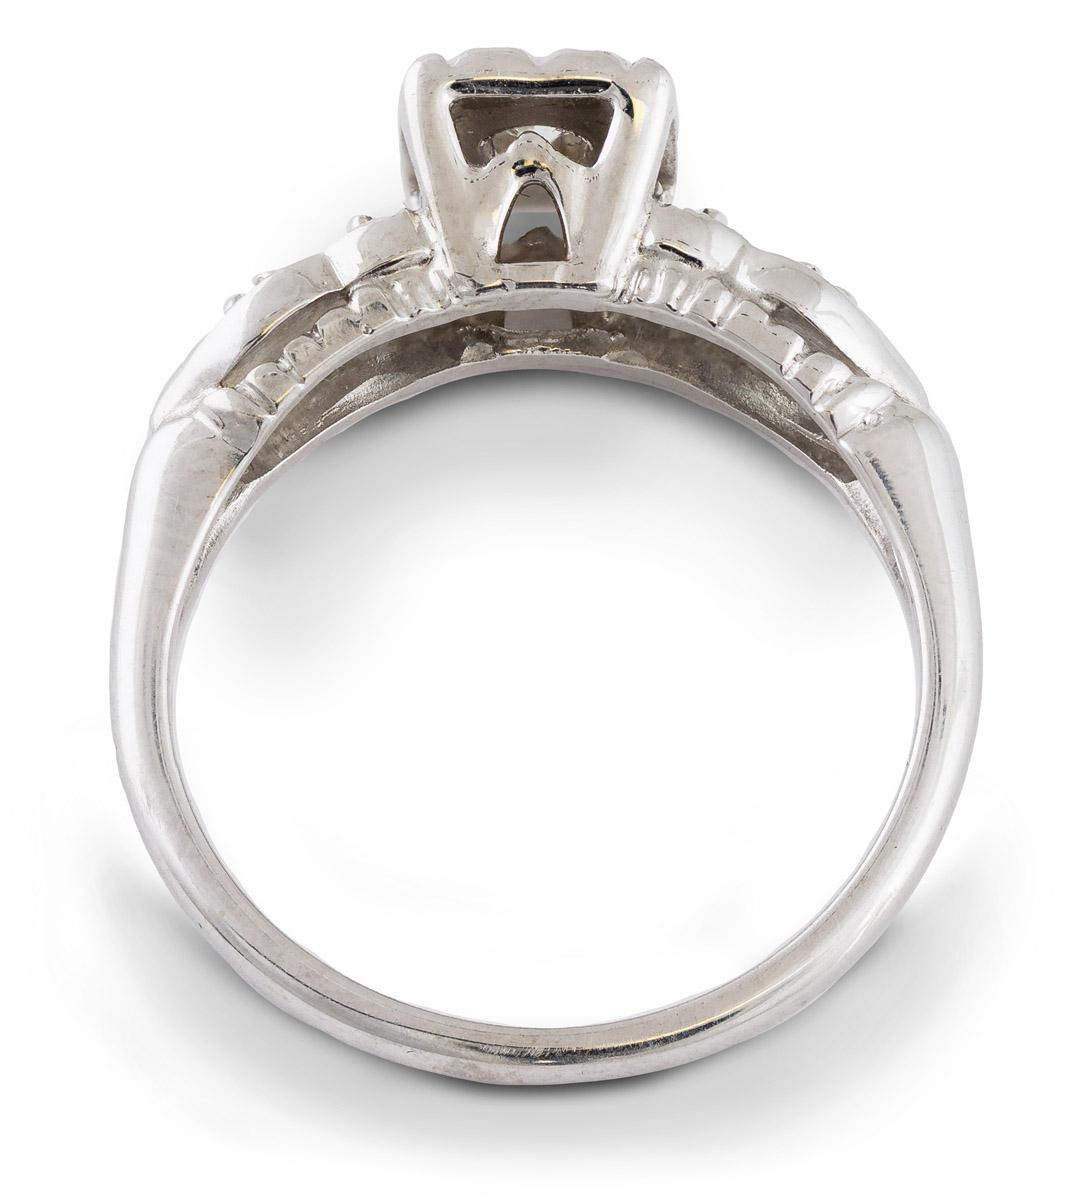 Vintage Diamond Engagement Ring with Illusion Setting